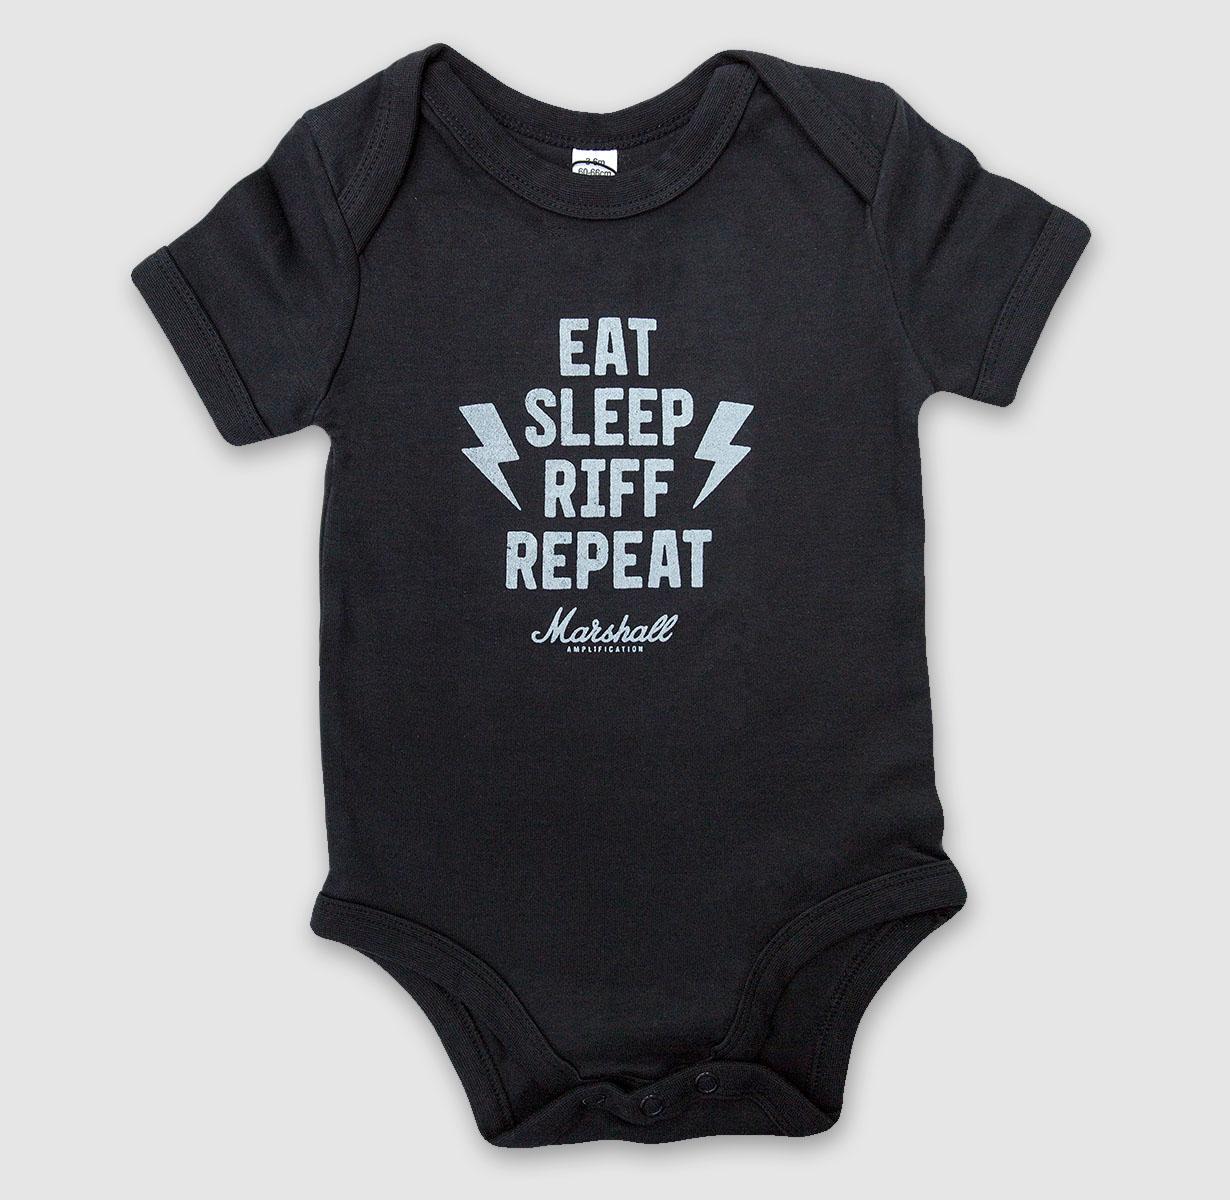 Baby Grow - Eat, Sleep, Riff, Repeat